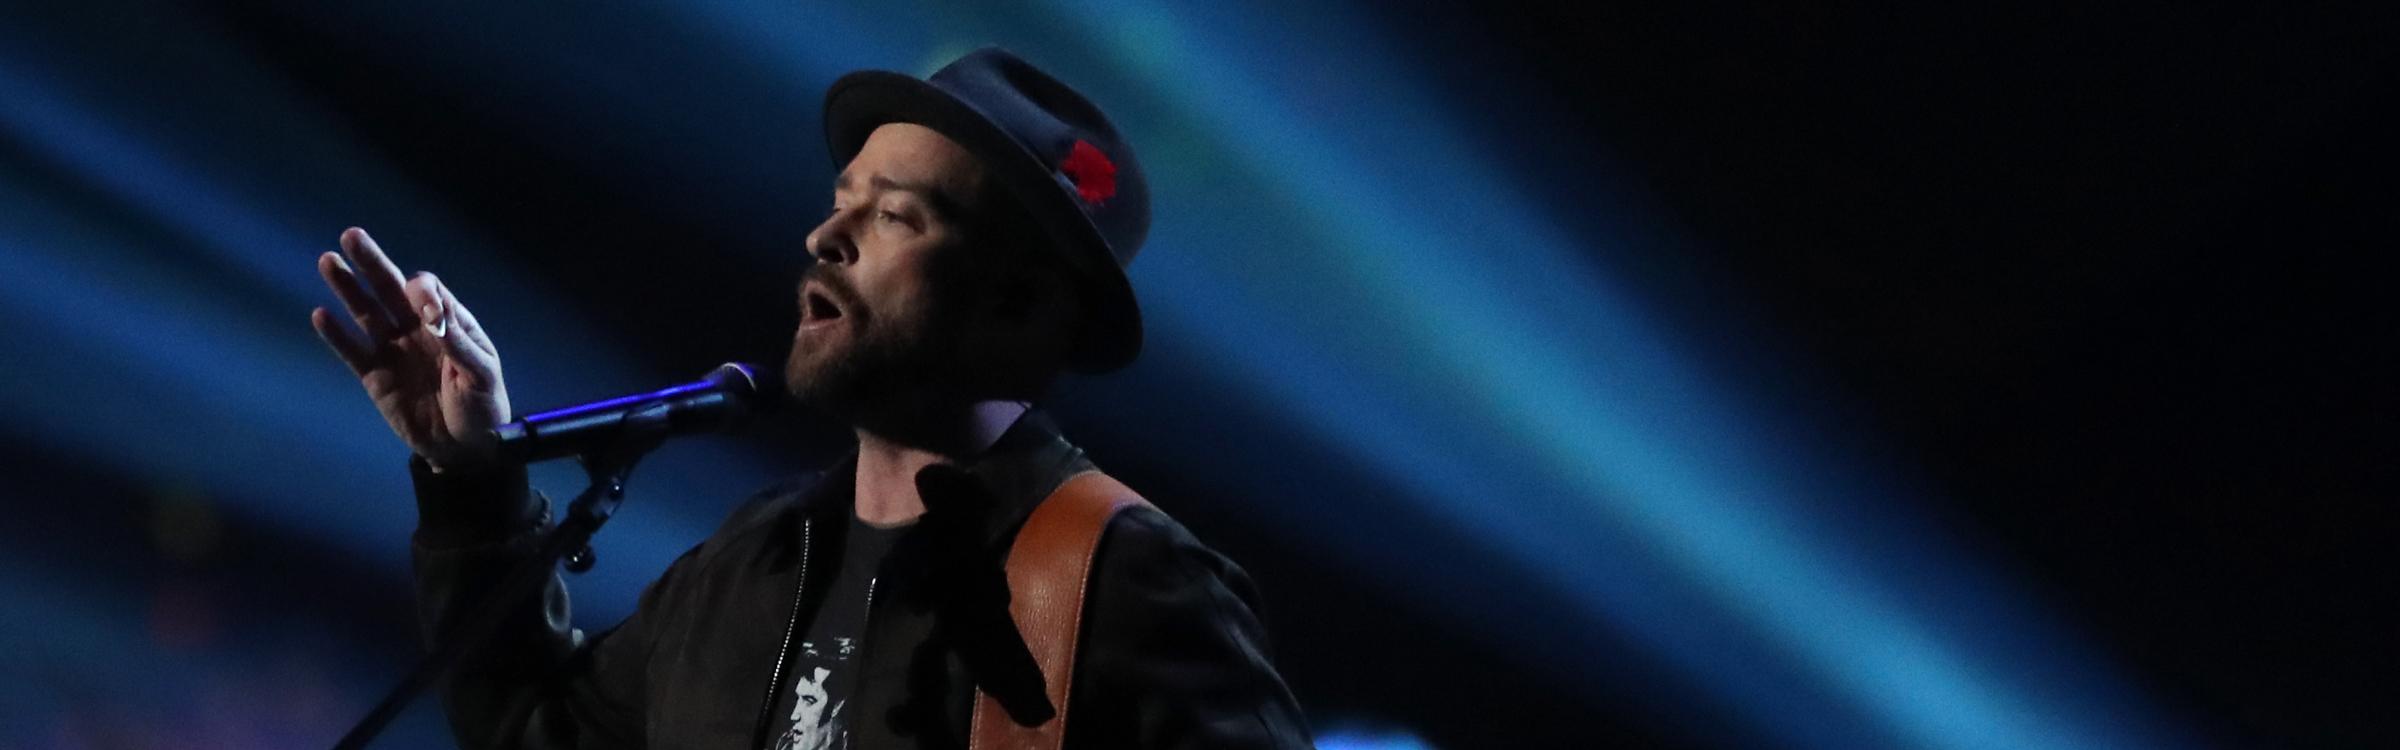 Timberlake header